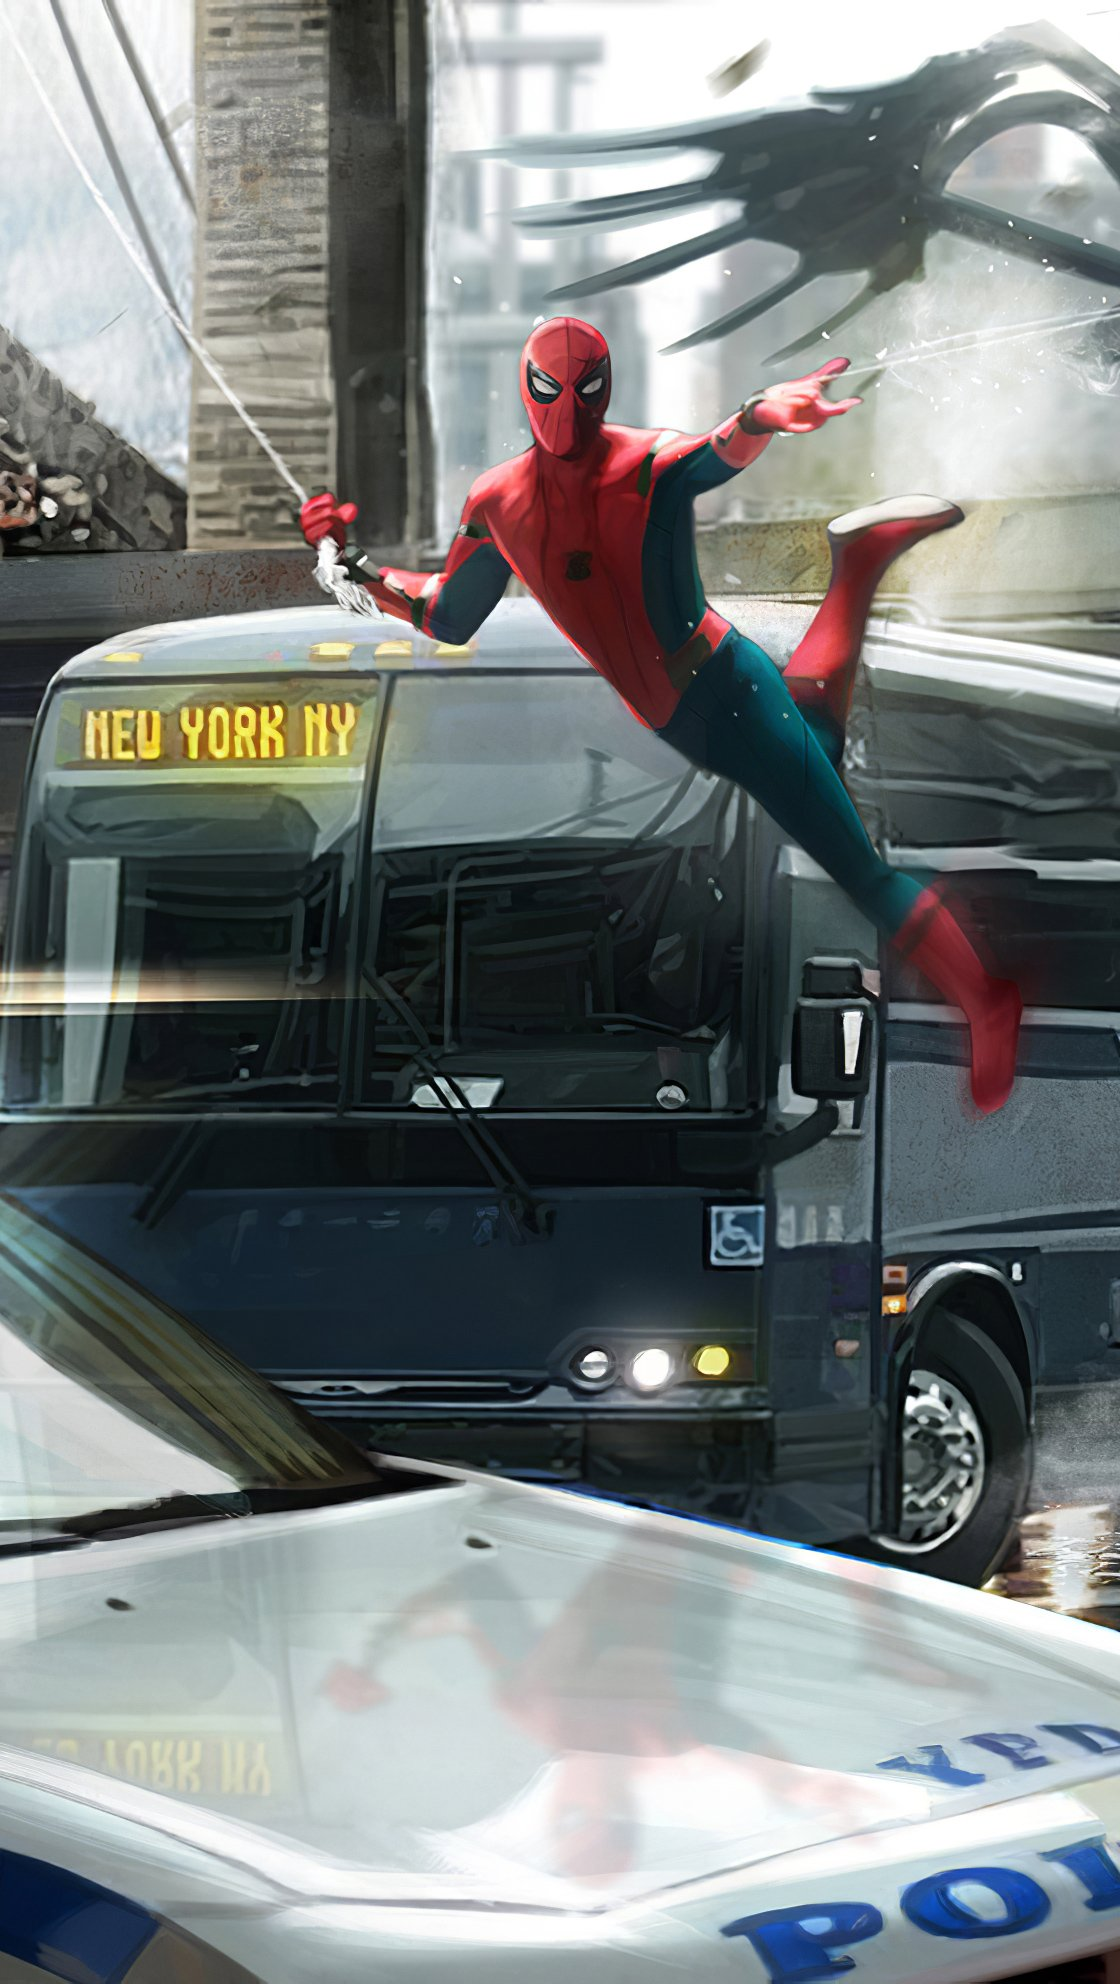 Fondos de pantalla Spiderman en Queens Fanart Vertical